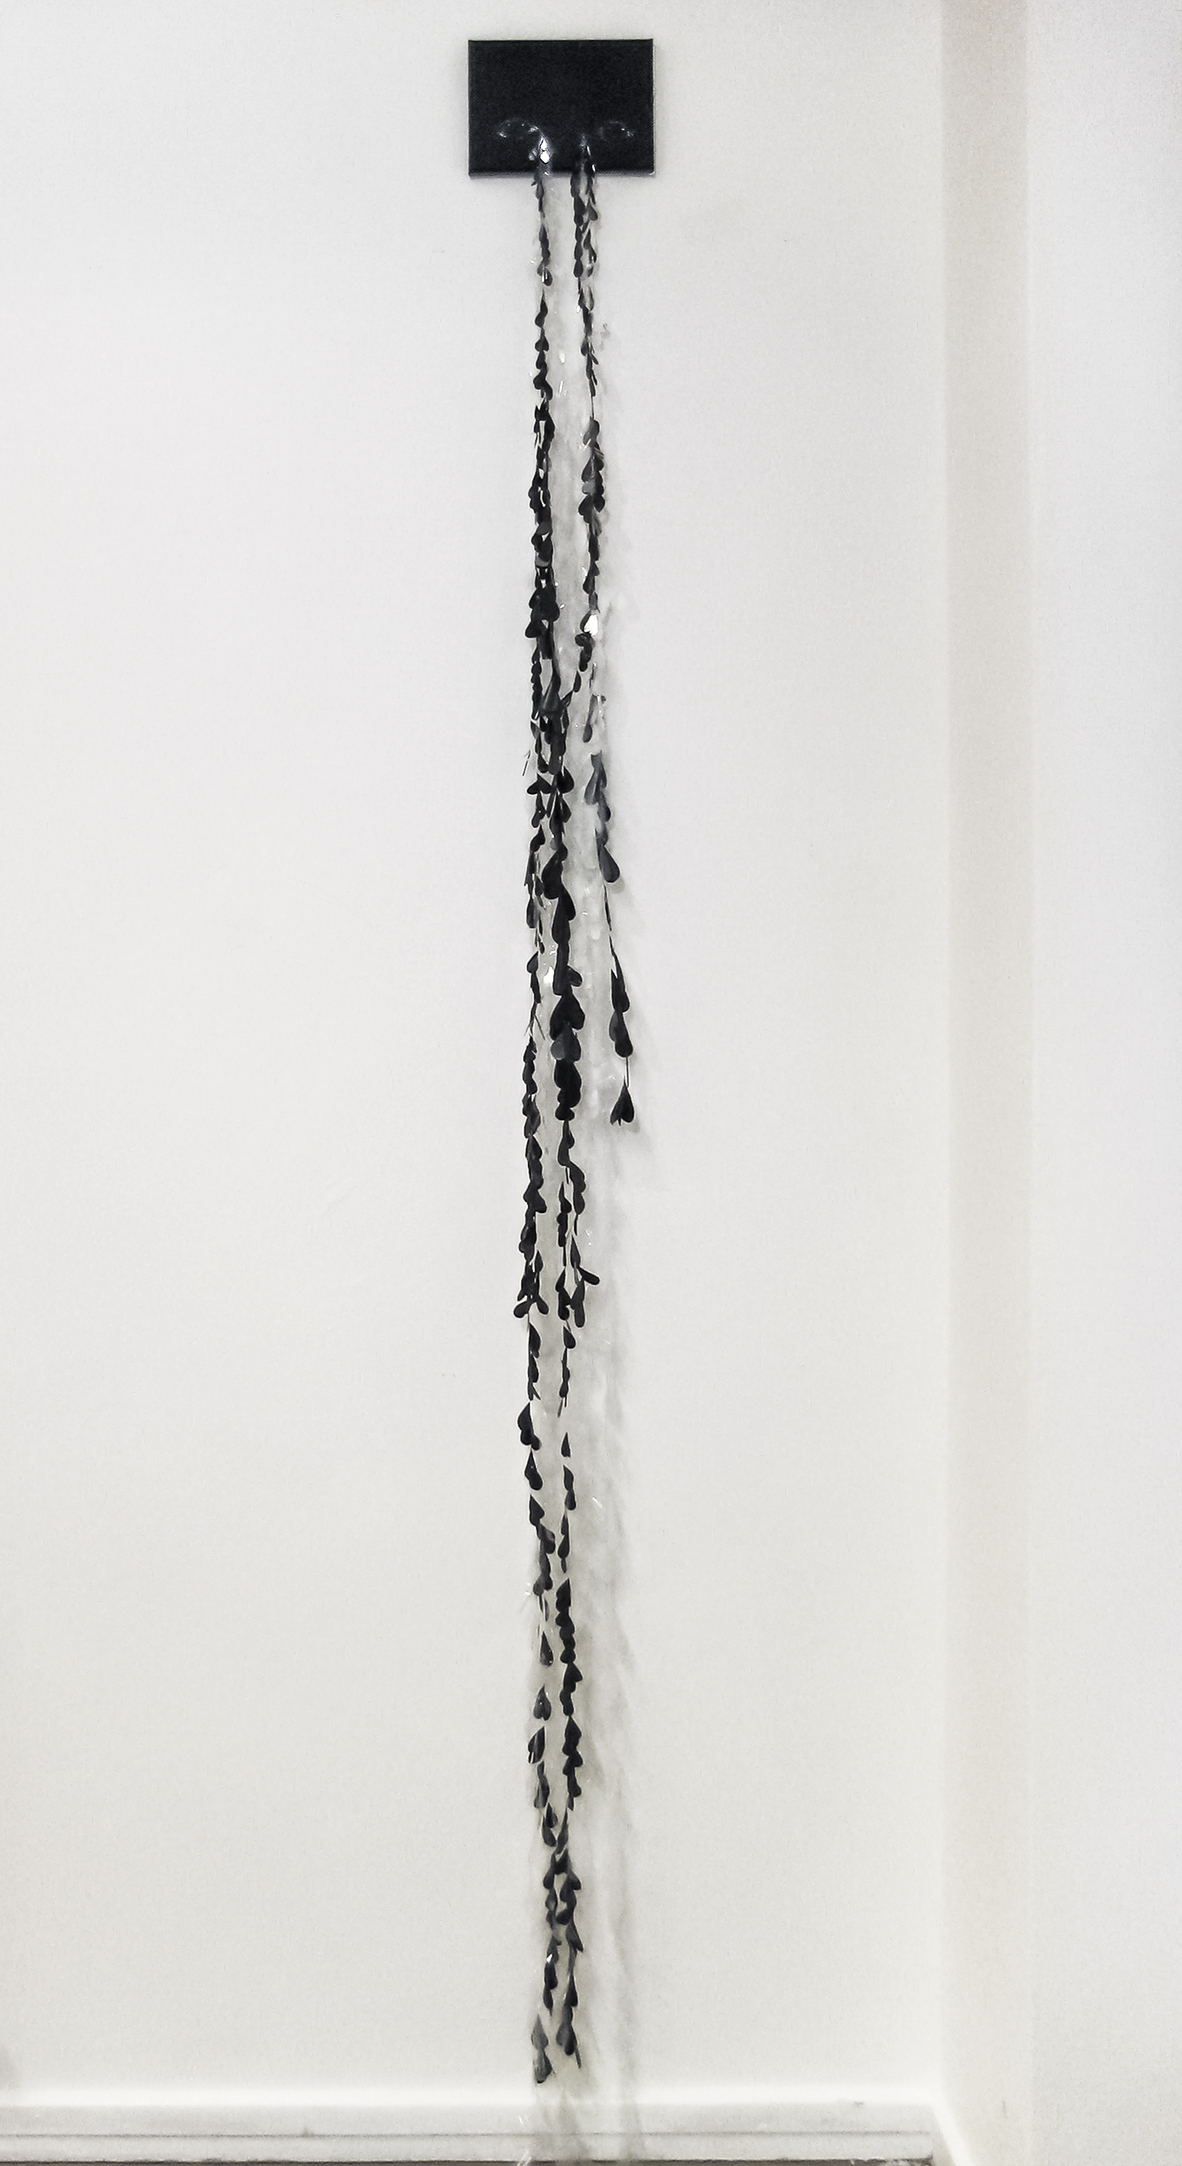 Elina Katara | Crocodile Tears | 2016 | acrylic paint on canvas, tears made out of domestic plastic waste.